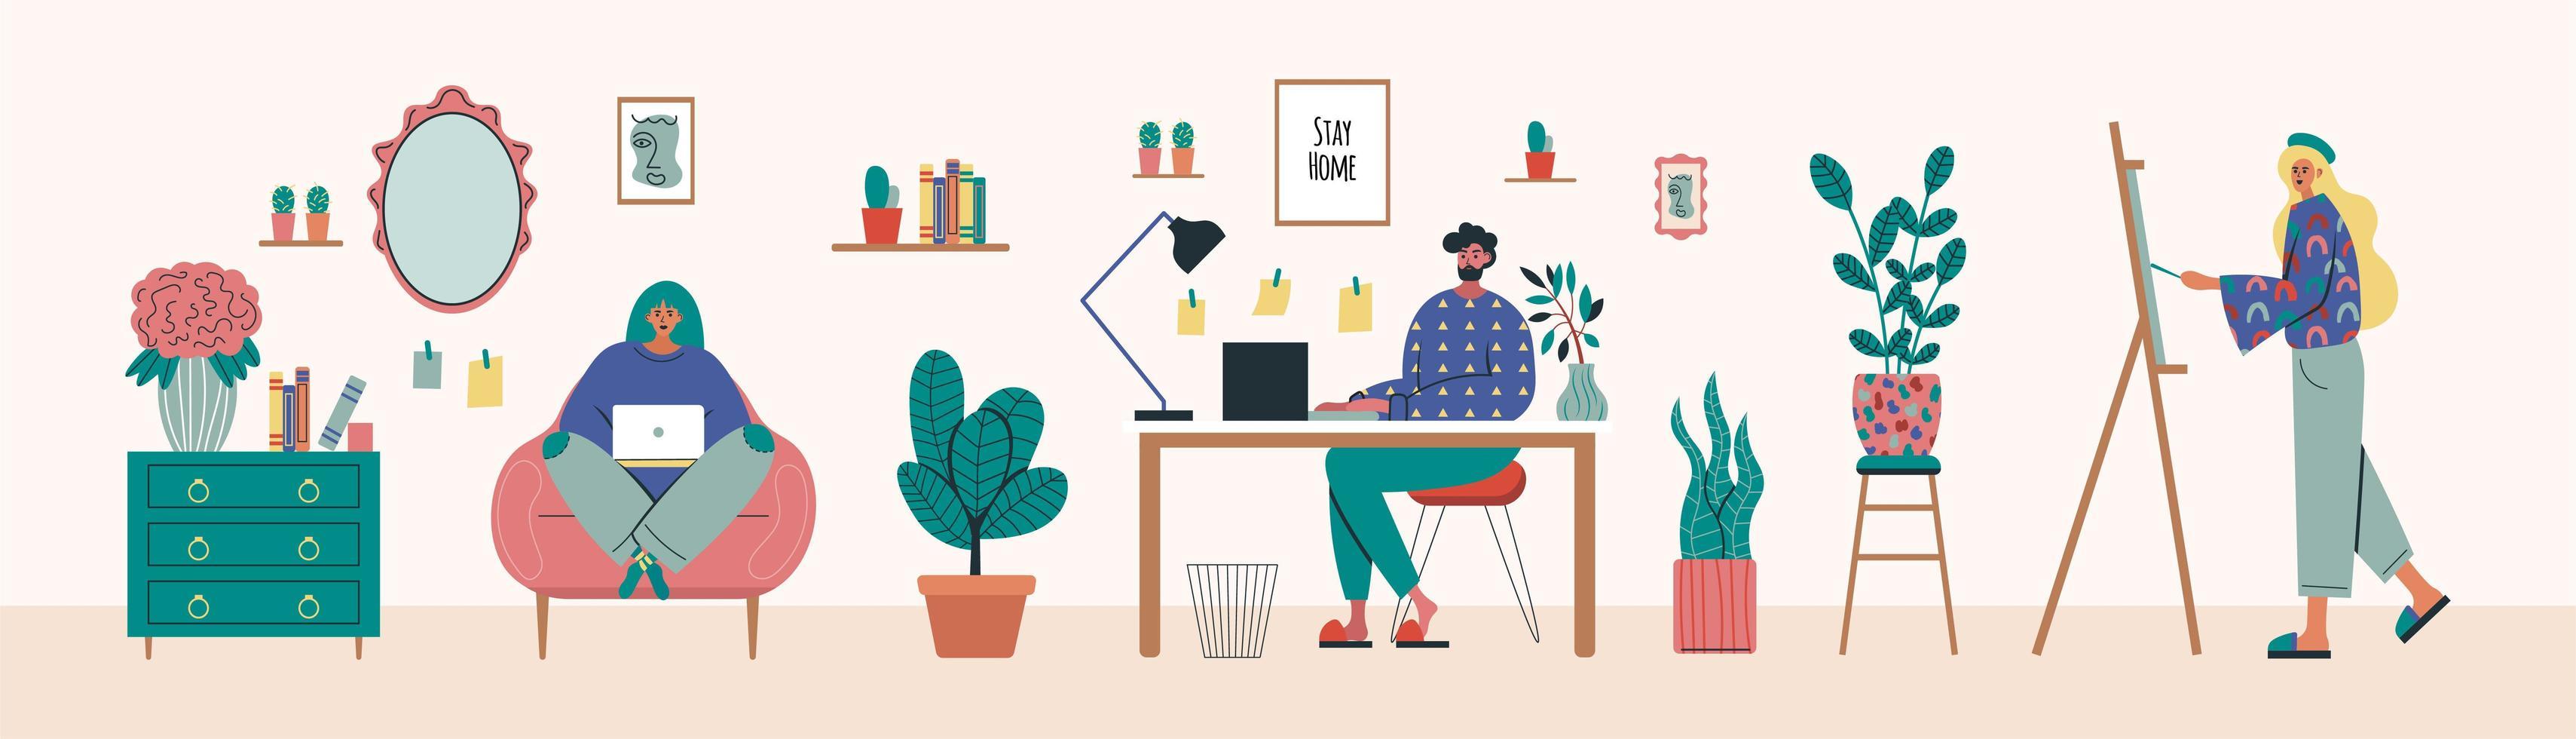 freelancekunstenaars die thuis werken vector